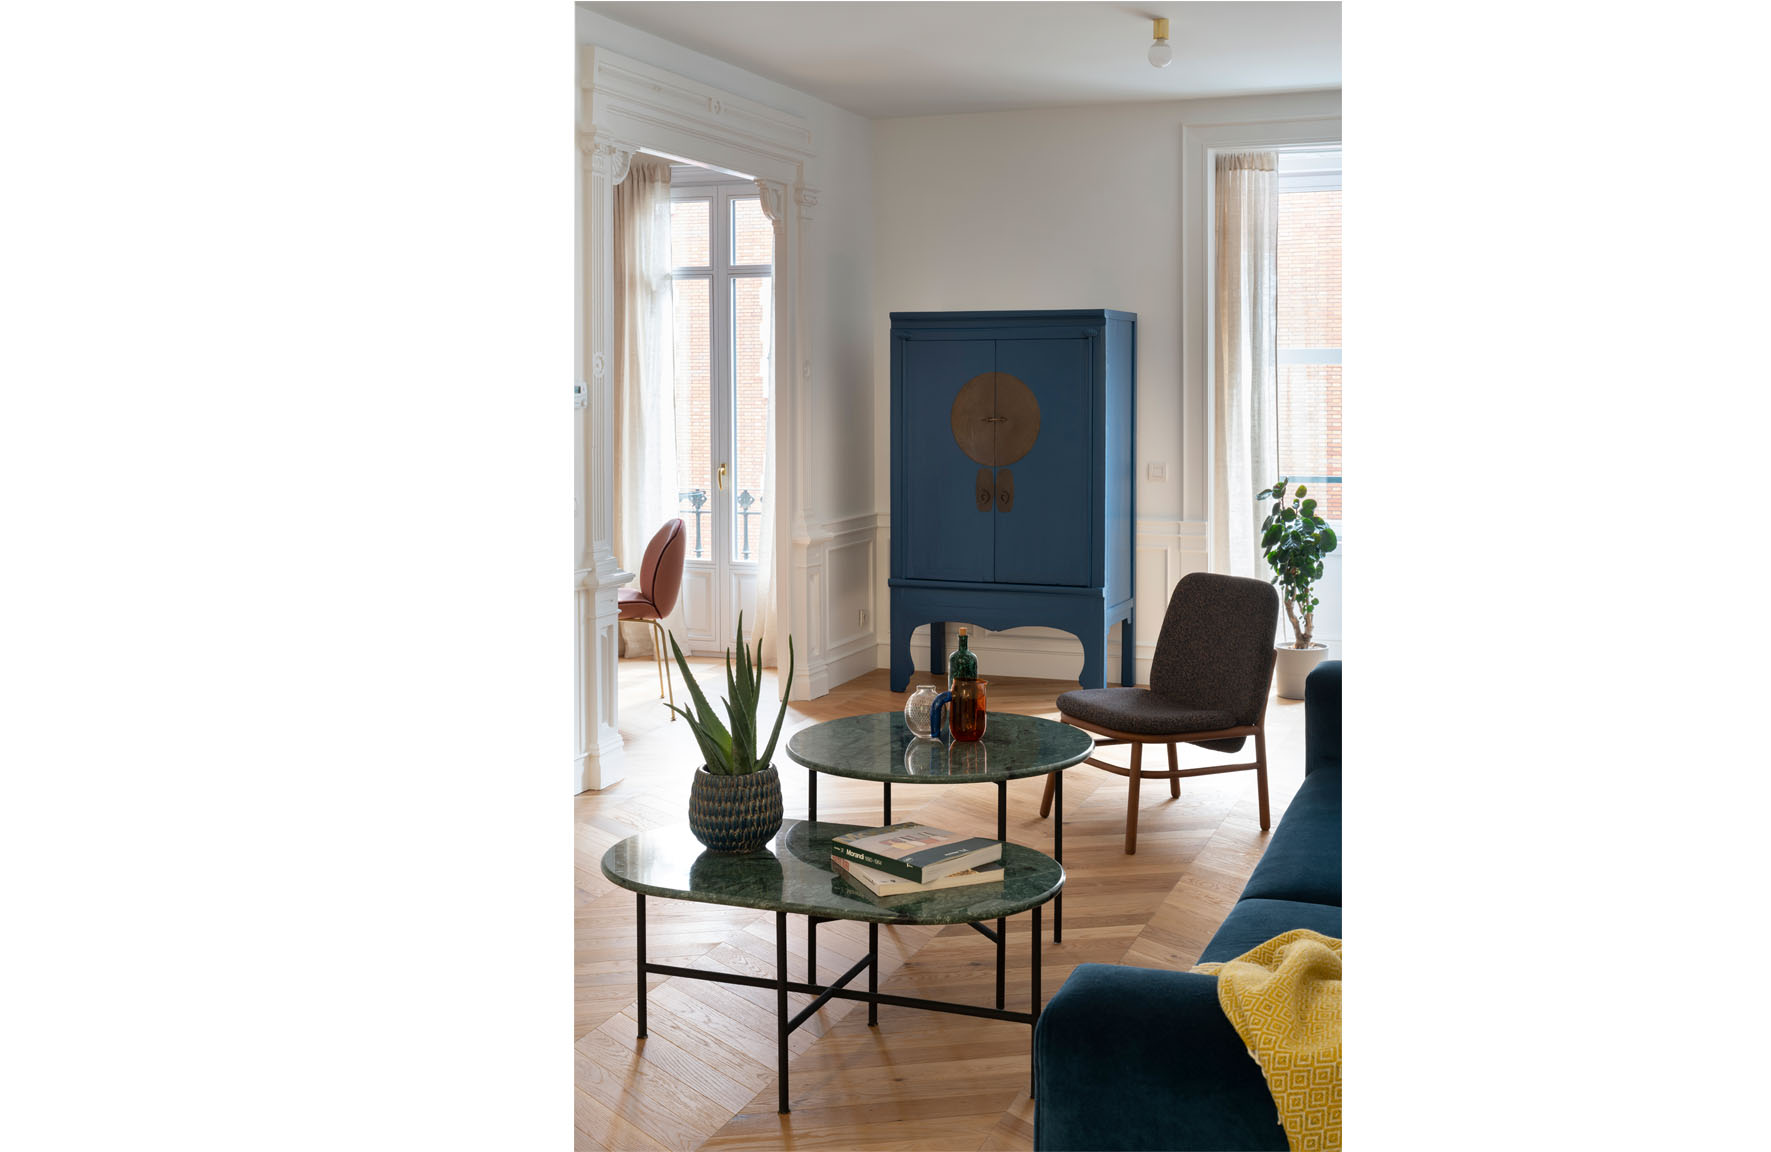 Apartment Elcano-Bilbao-Image 01.jpg